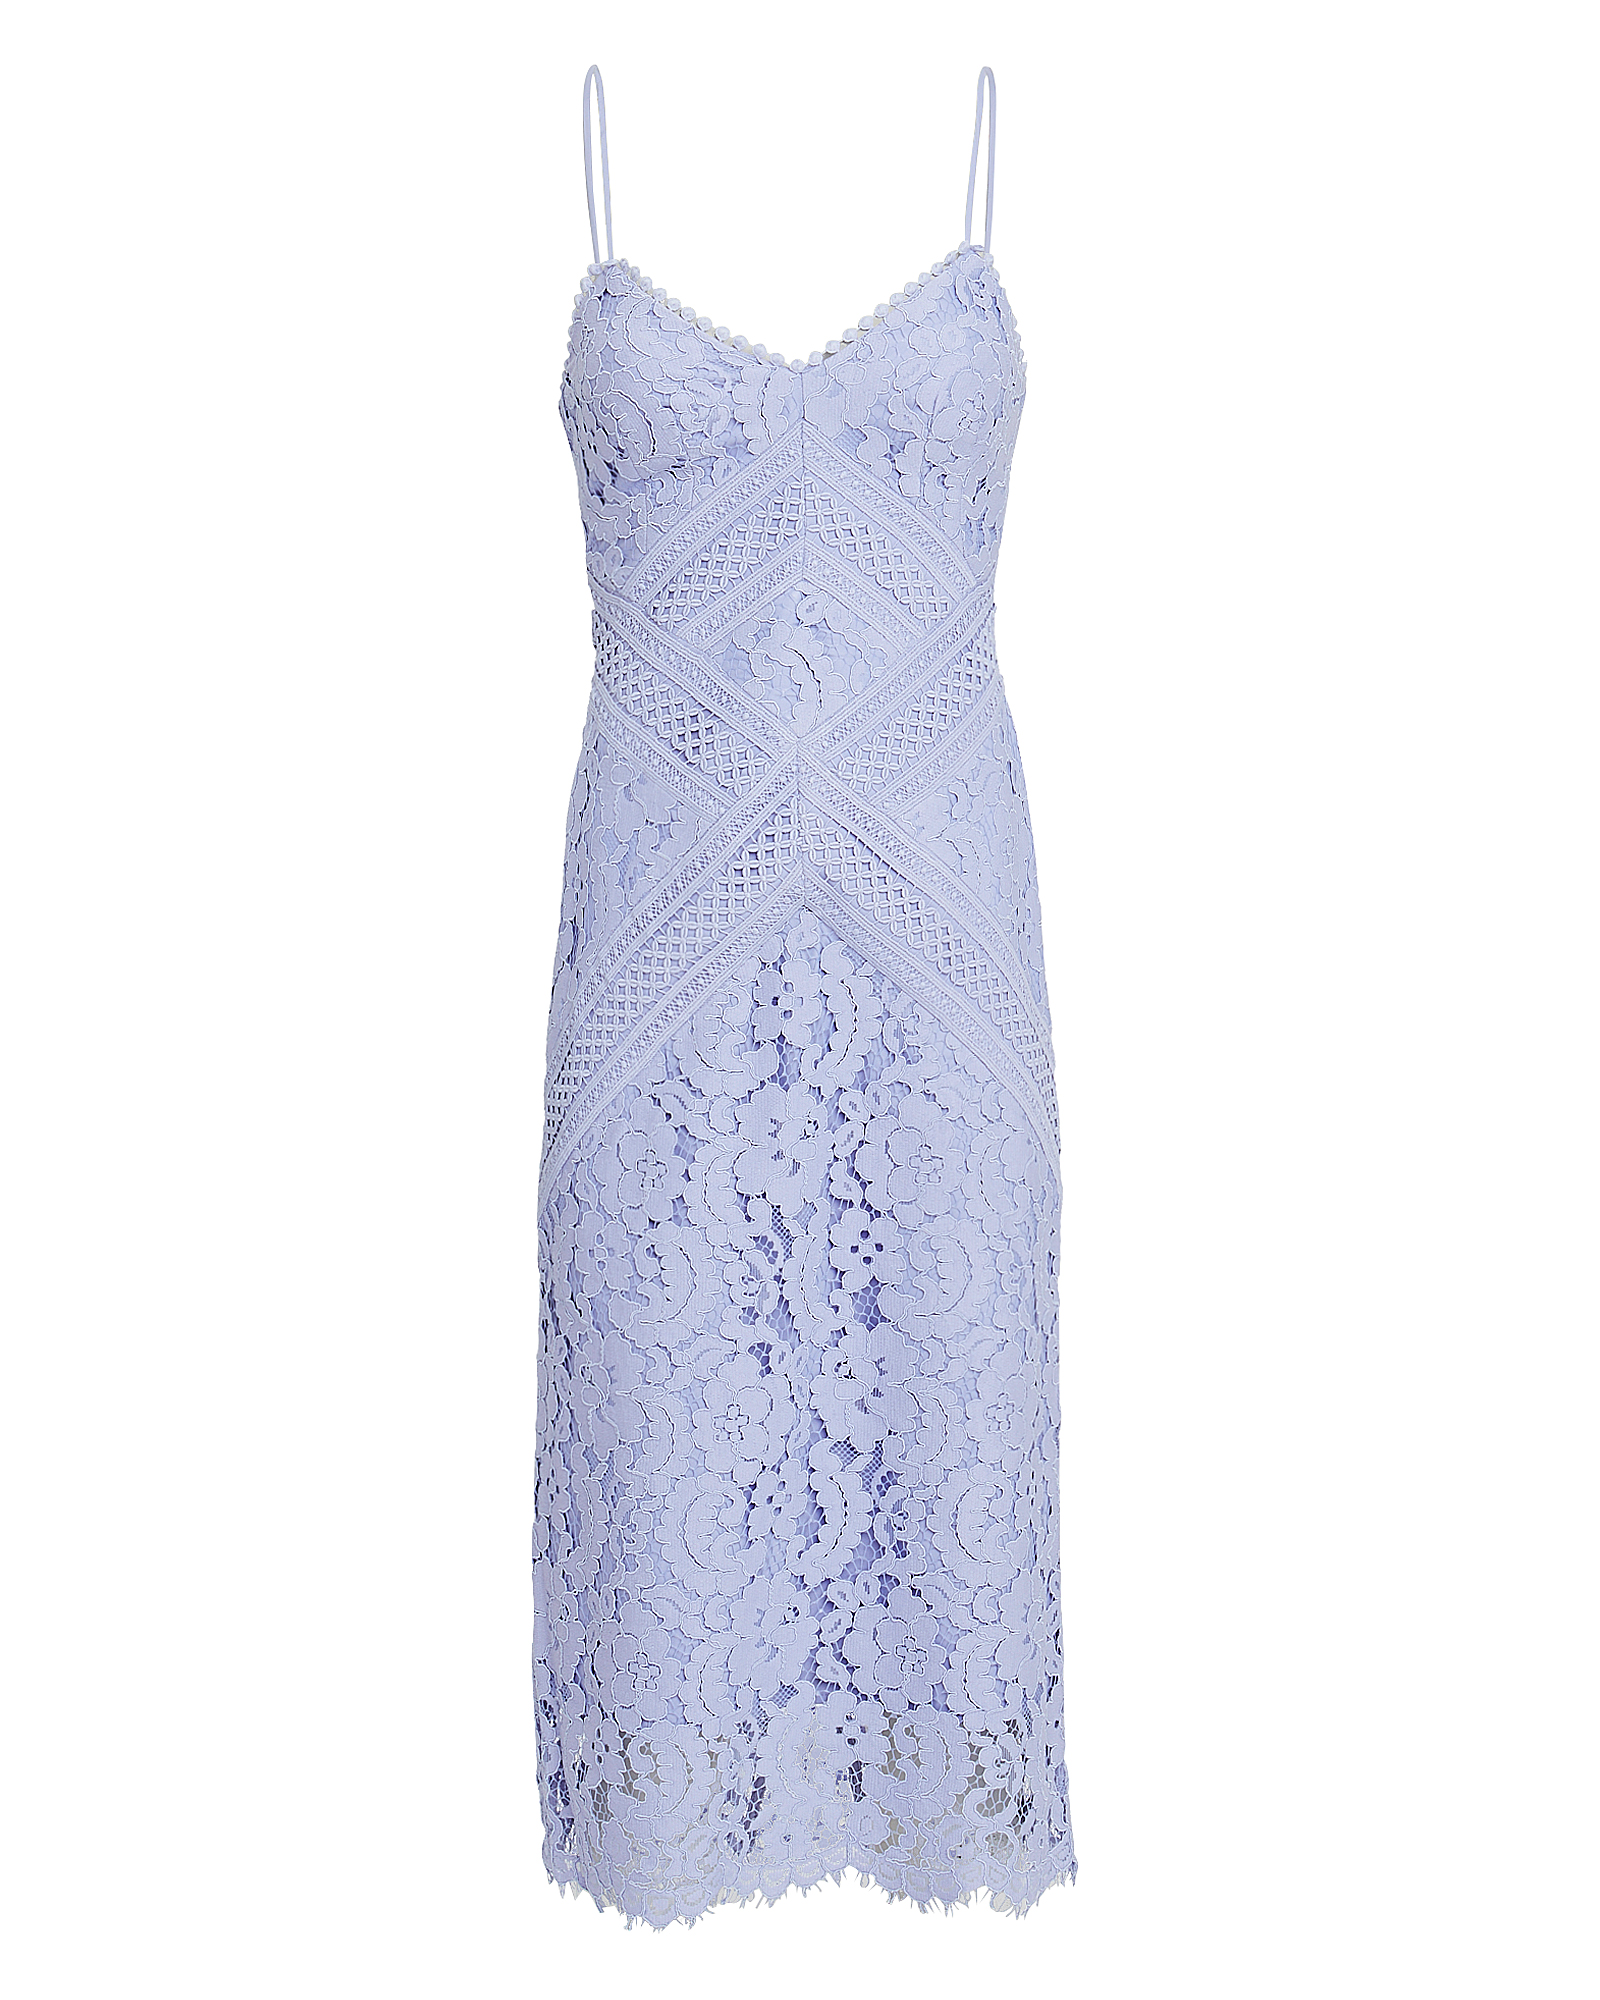 LOVER Melody Lace Dress Light Blue